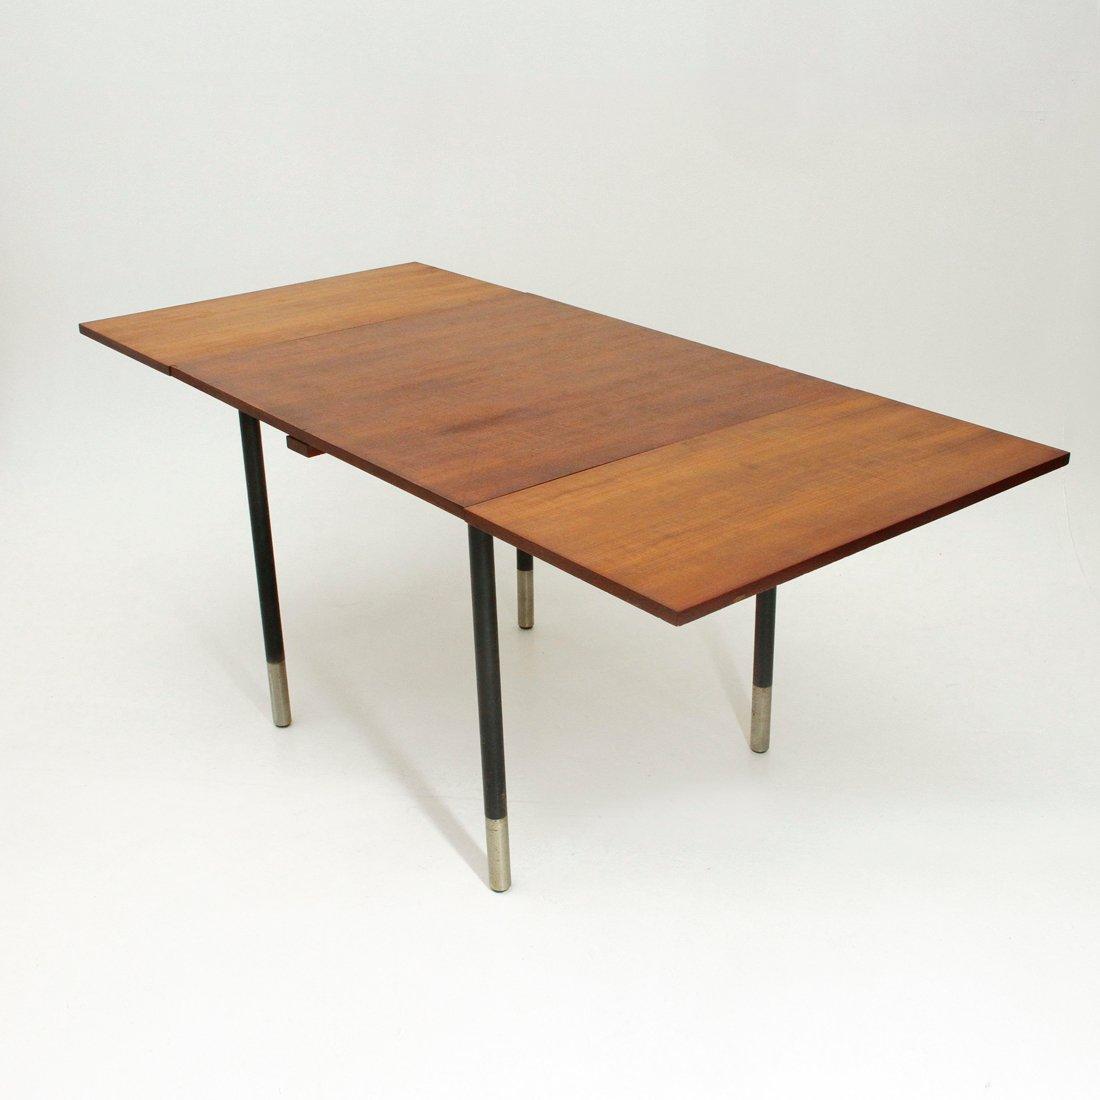 Square Extendable Teak Table by Giampiero Vitelli for Rossi di ...